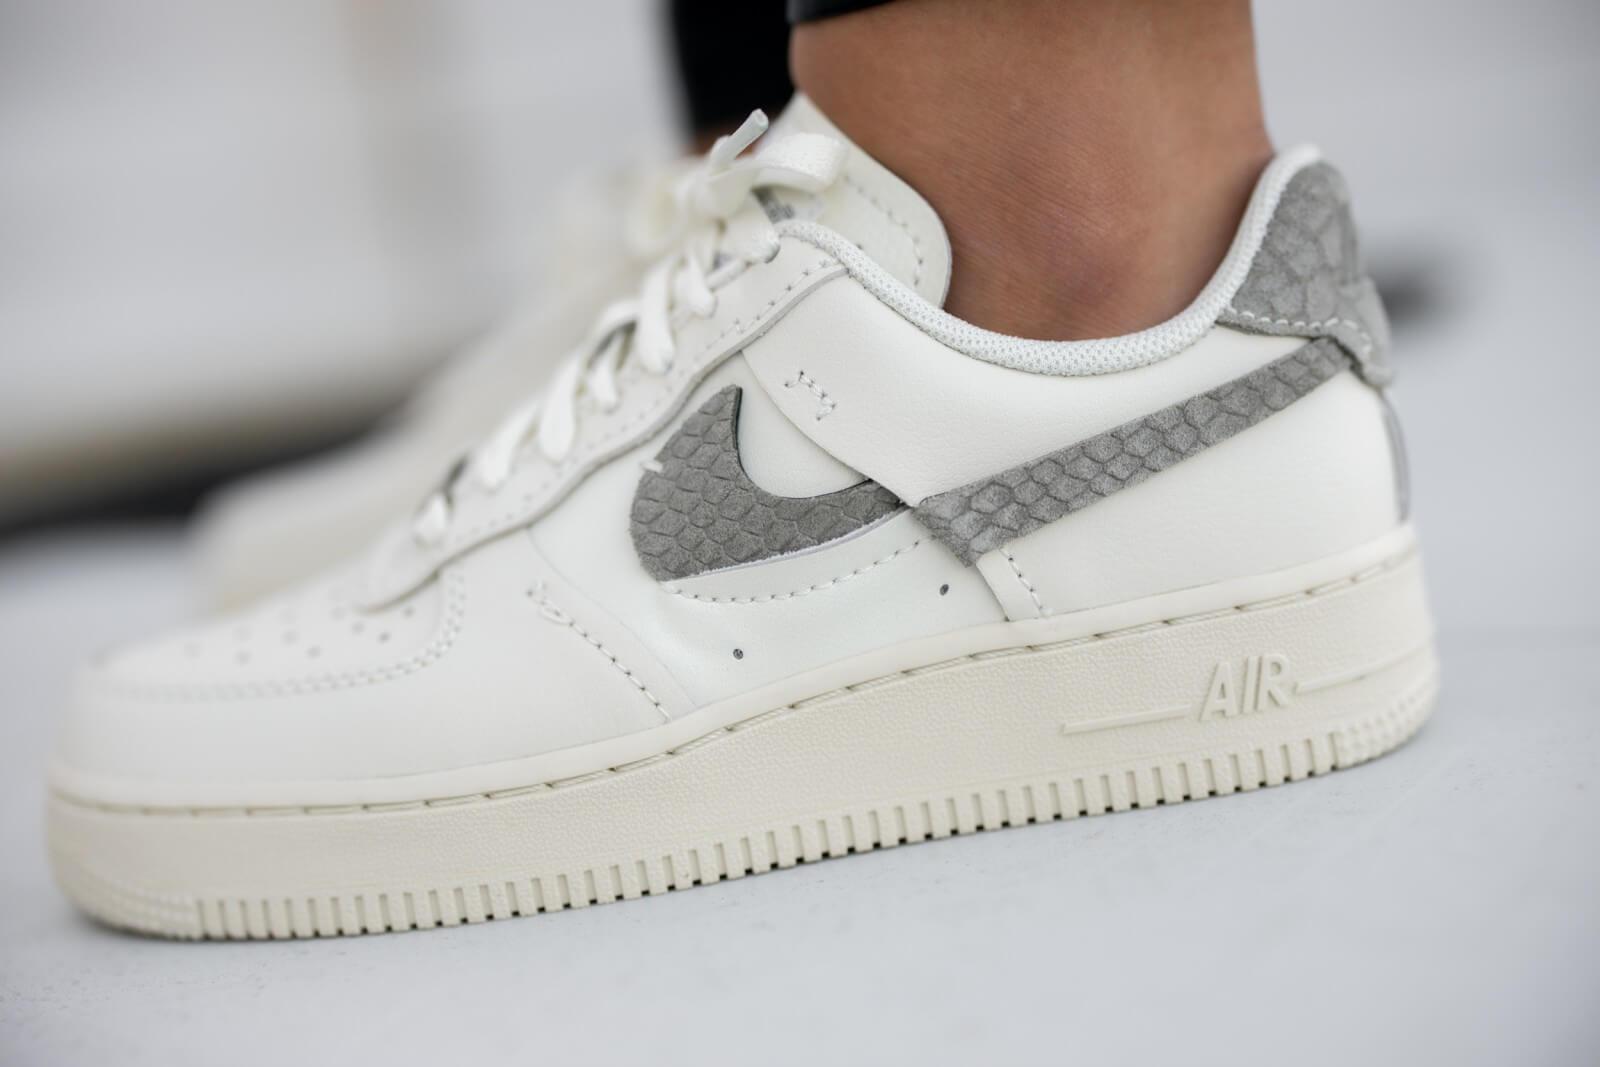 Nike Women's Air Force 1 LXX Sea Glass/Light Army